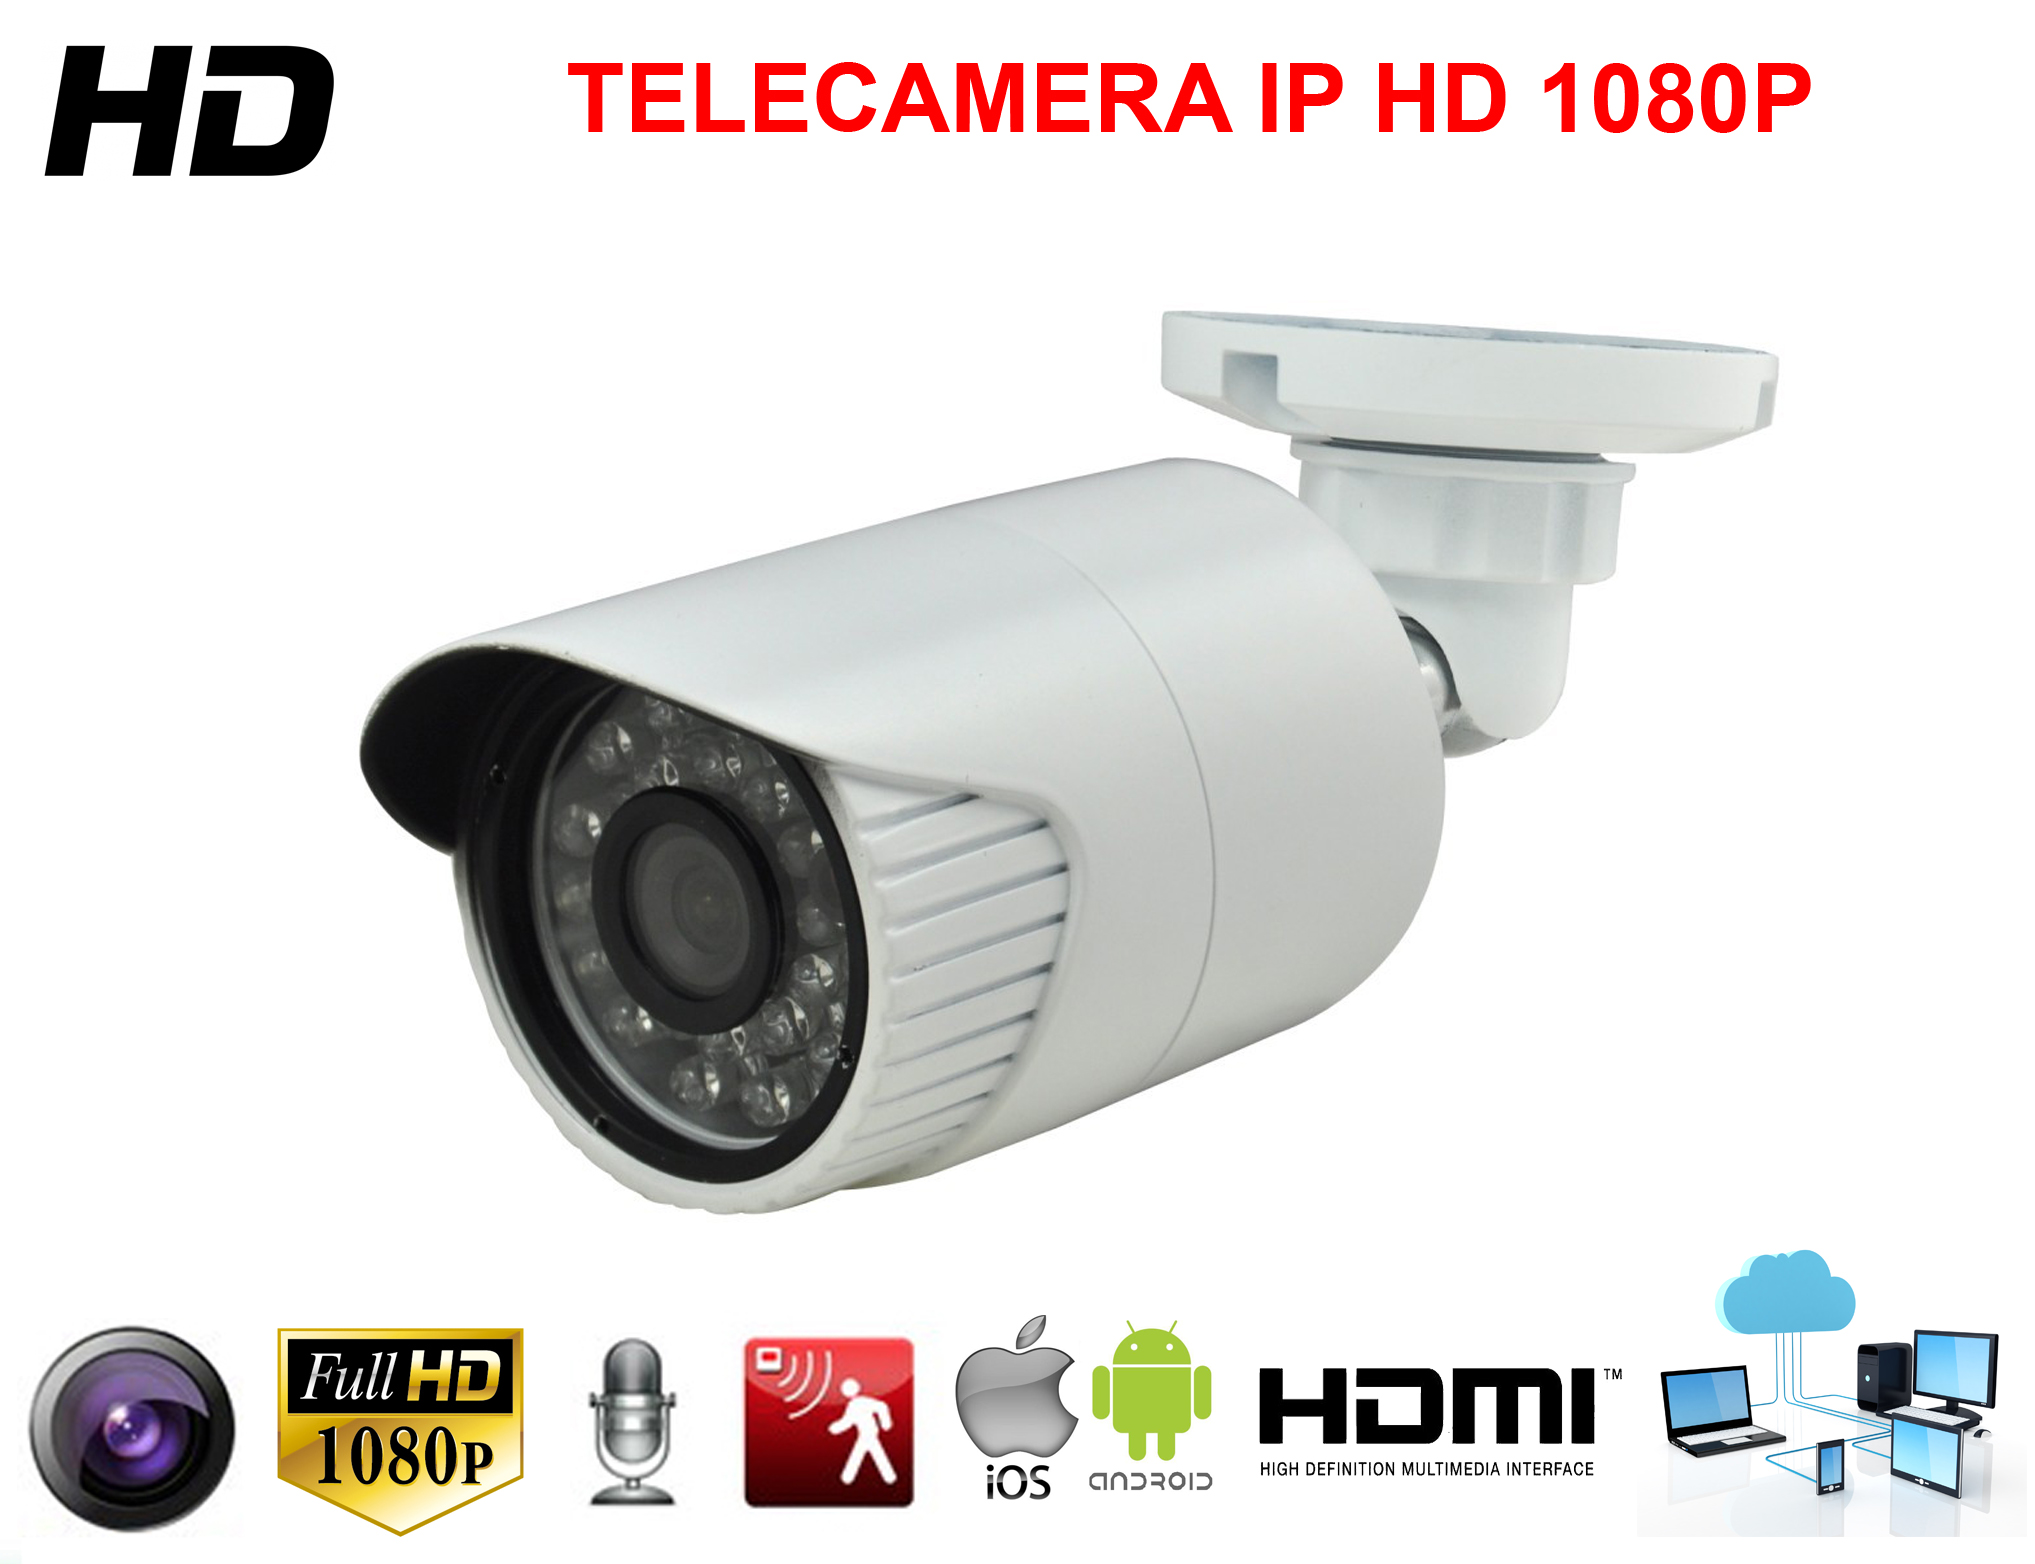 TELECAMERA HD IP 2.2 MPX VIDEOSORVEGLIANZA 1080P 5 MM 24 LED NOTTURNI BULLET NVR